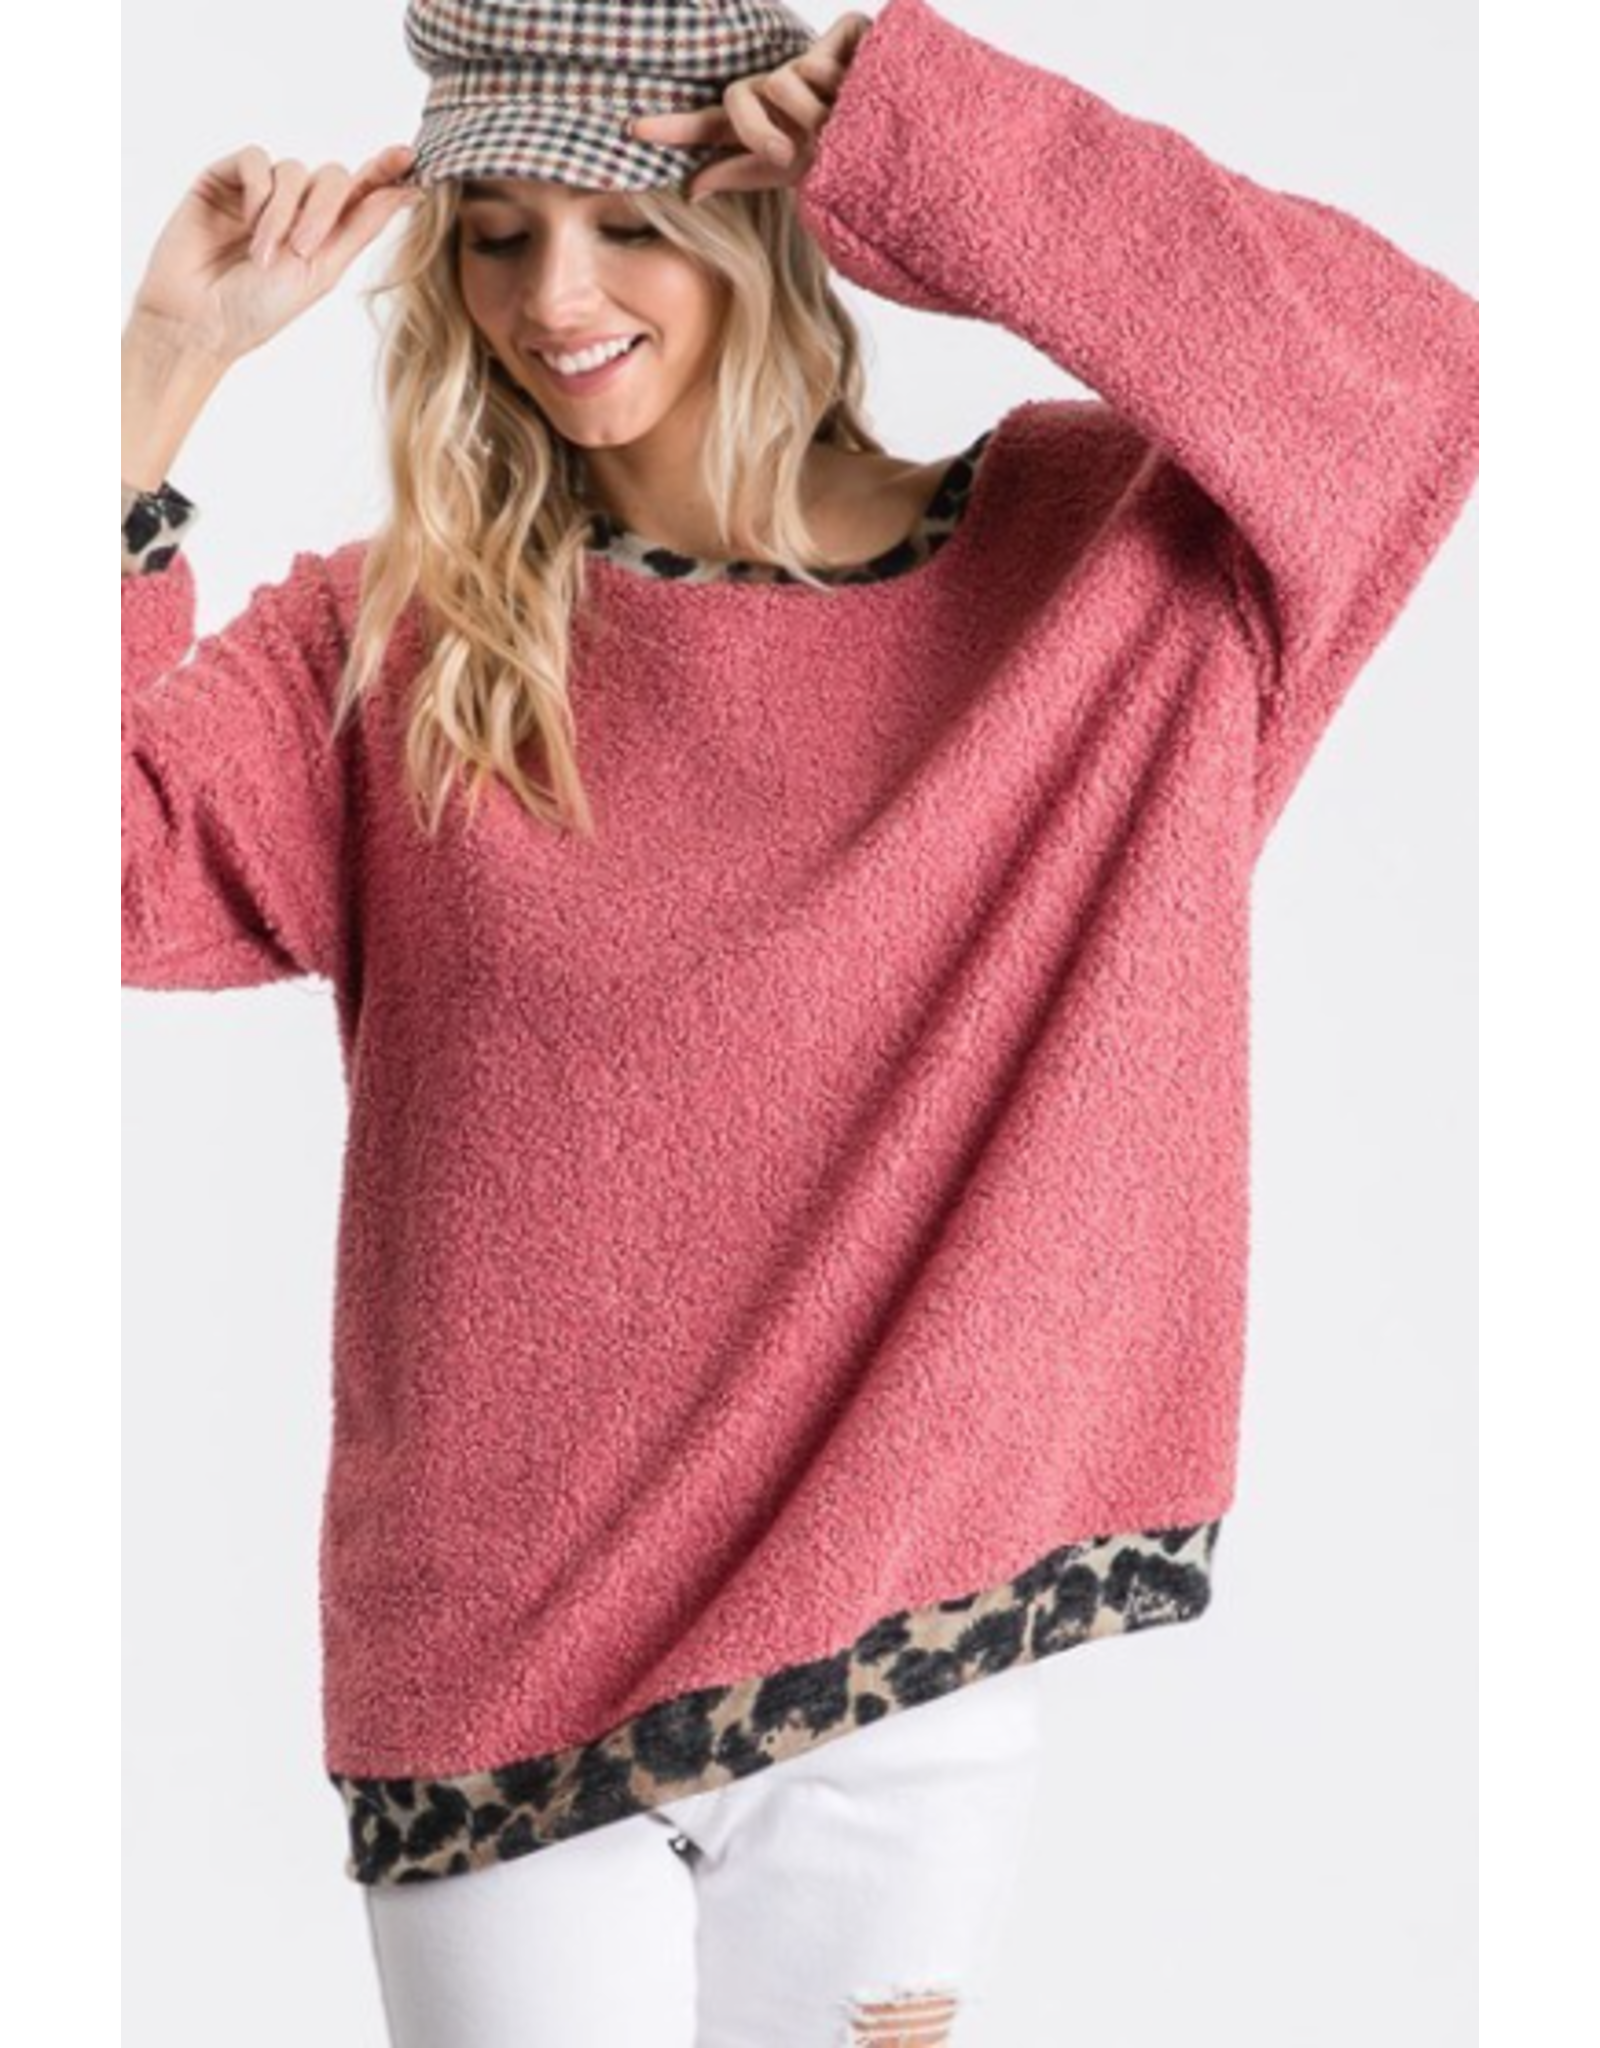 Romy - Popcorn knit top with animal print trim